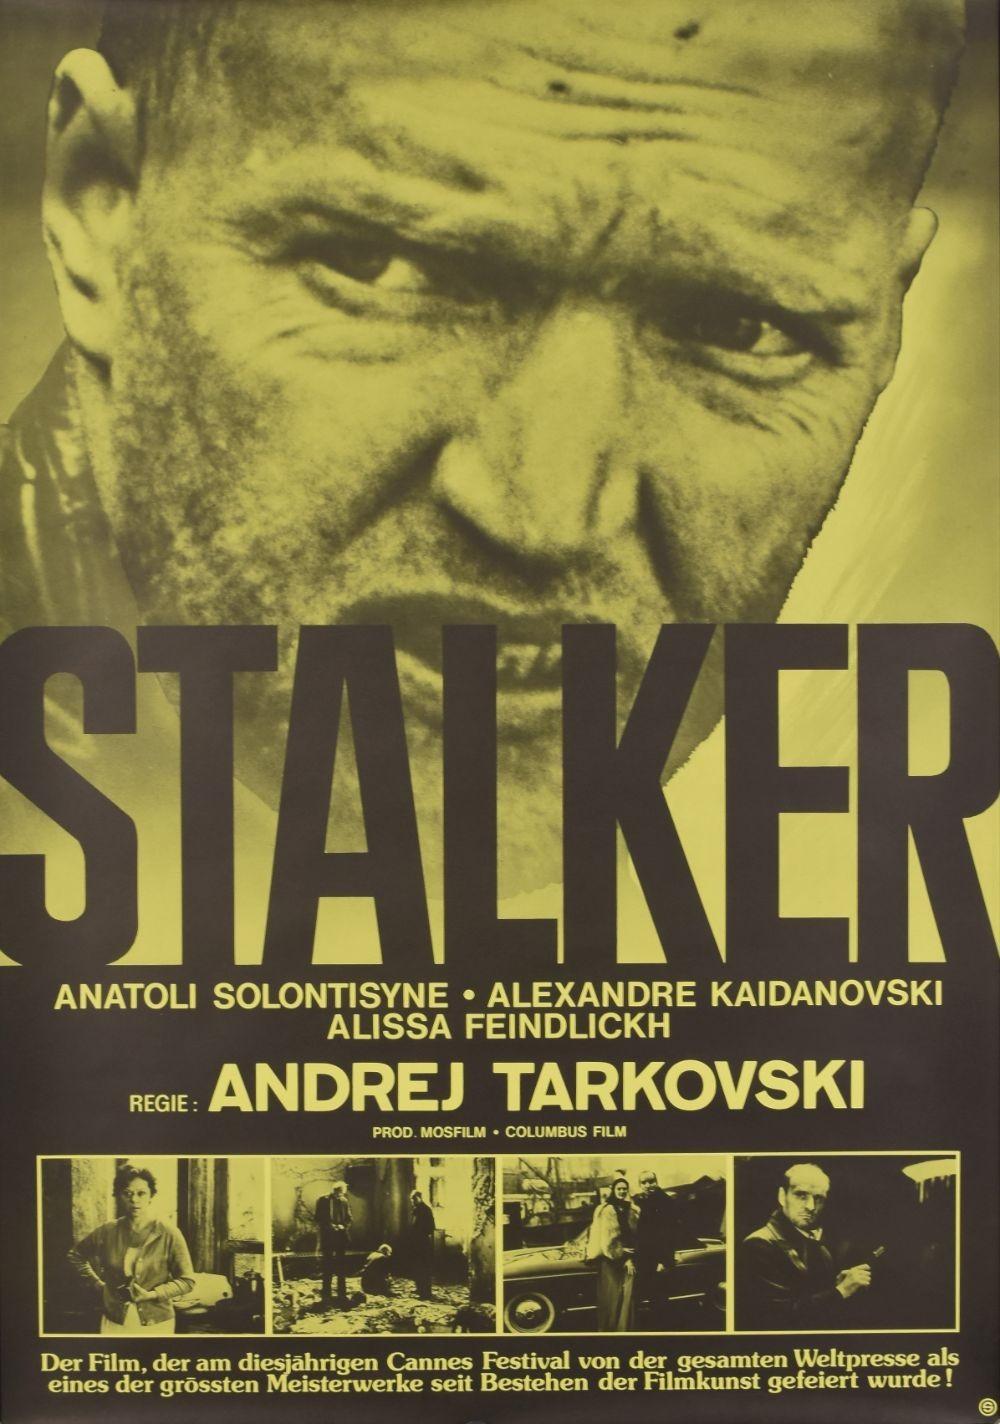 Stalker original movie poster